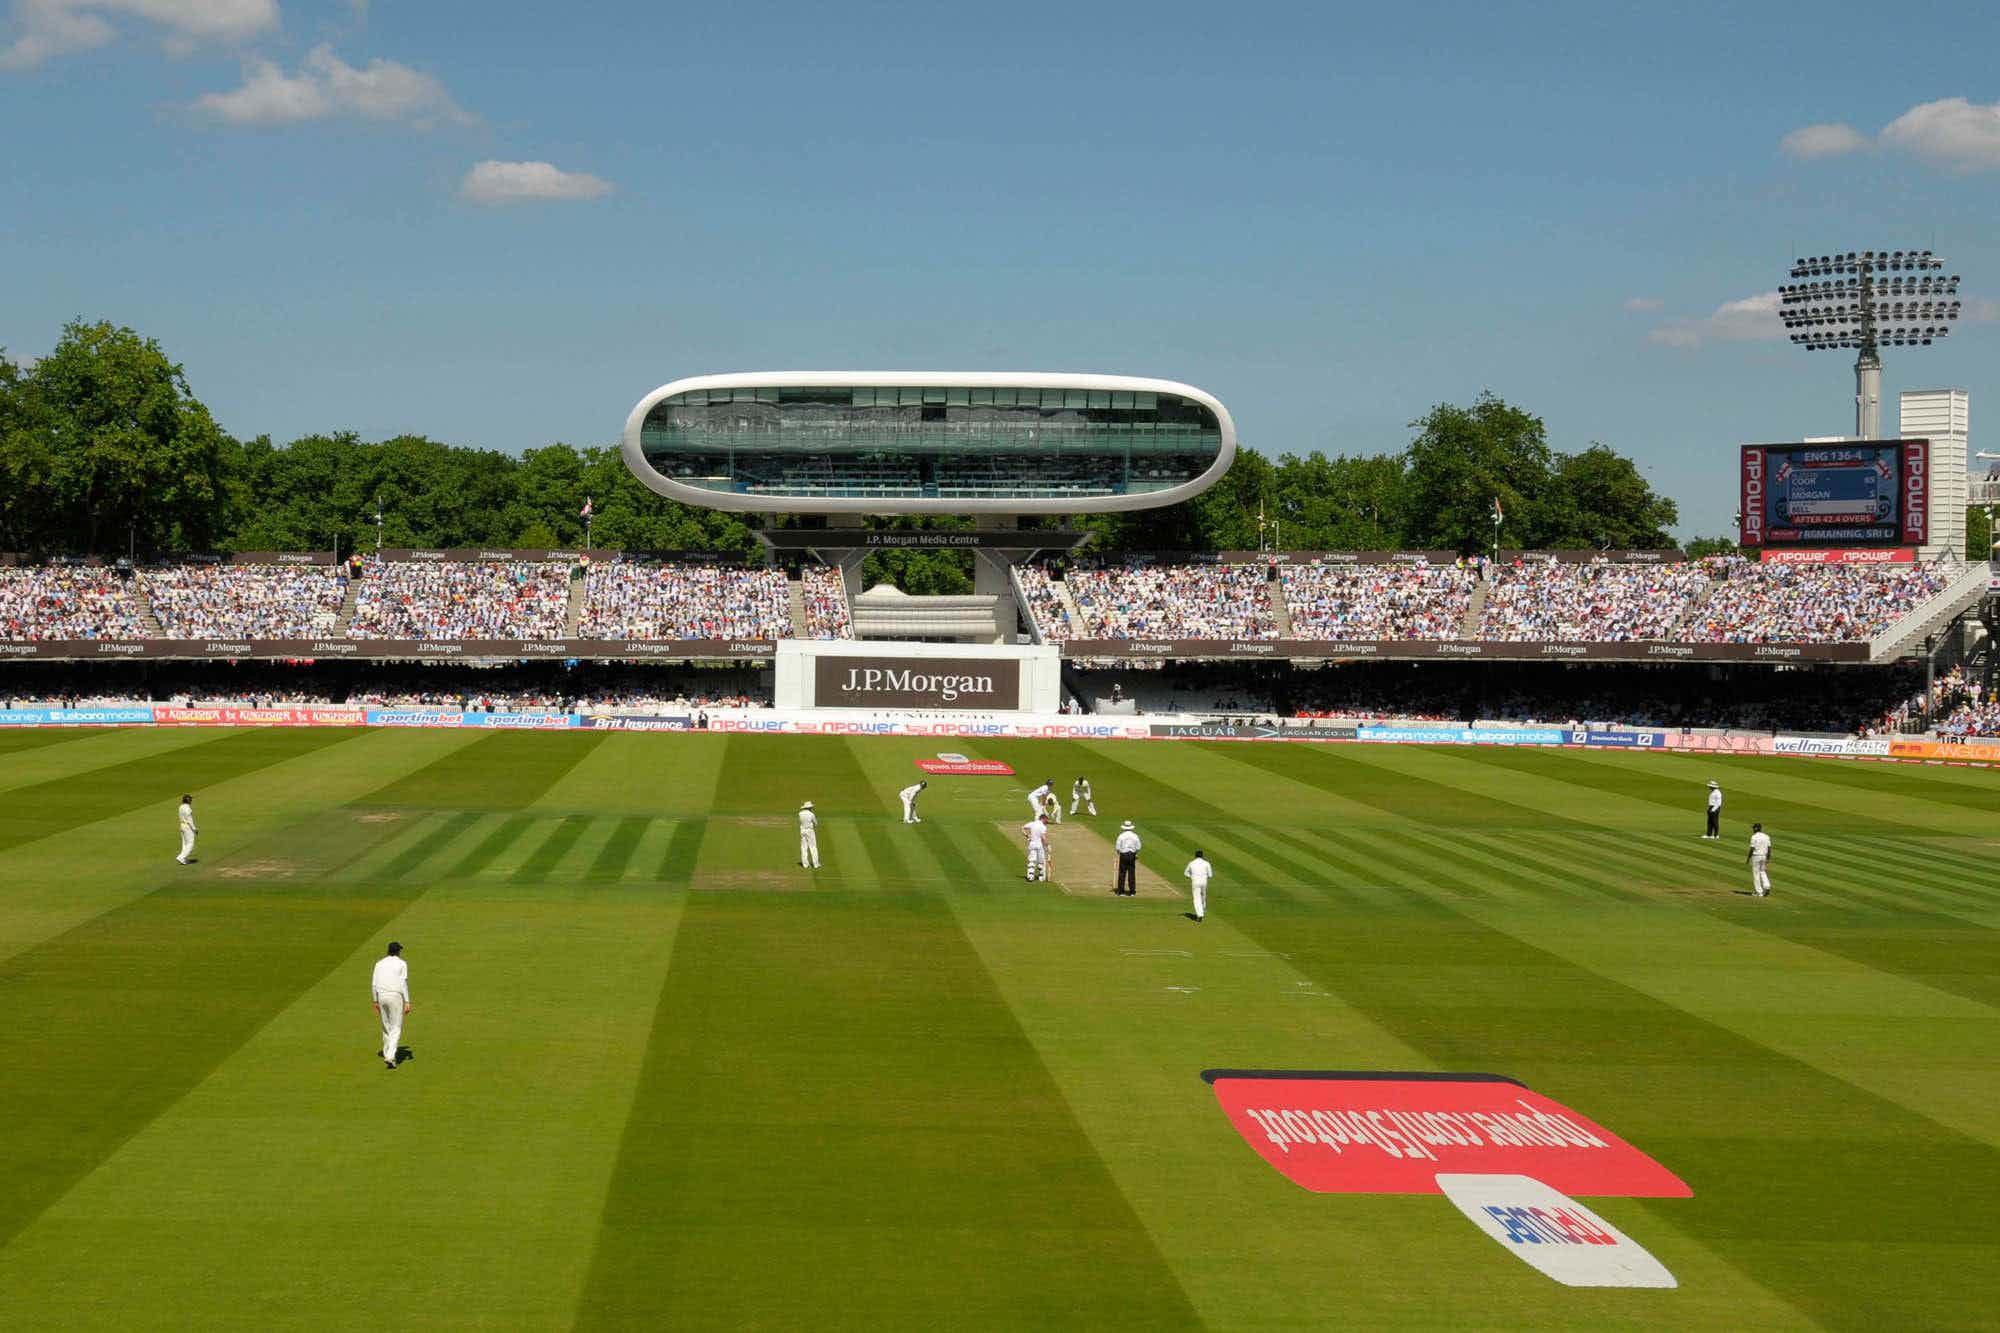 J.P. Morgan Media Centre, Lord's Cricket Ground